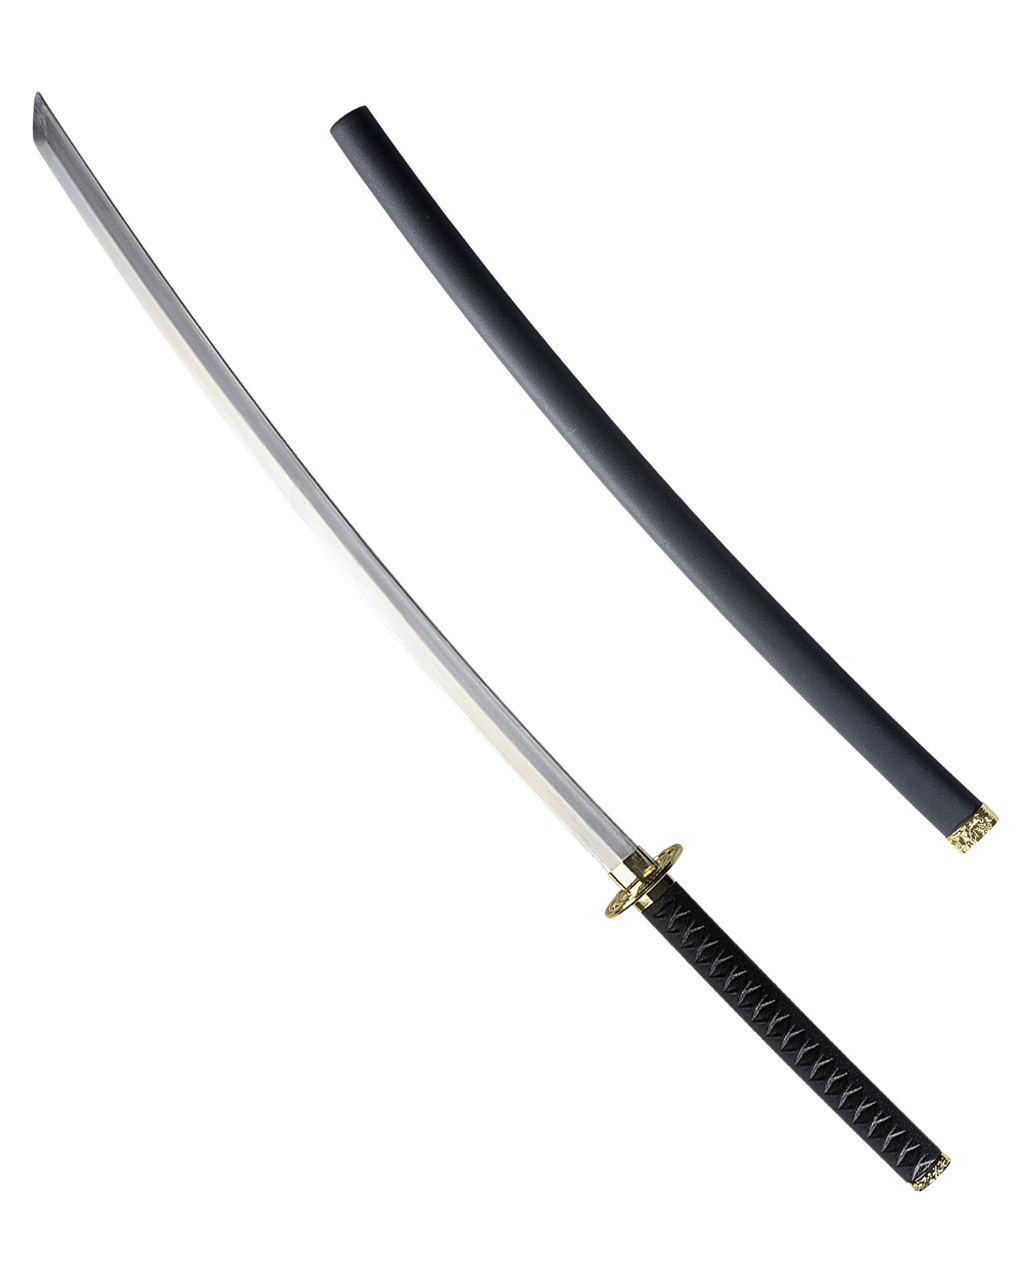 Petición de Meitou/Armas Legendarias - Página 15 Katana-samuraischwert-ninja-waffe-karnevalswaffe-asiatisches-kampfkostuem-metallic-katanas-18474-1